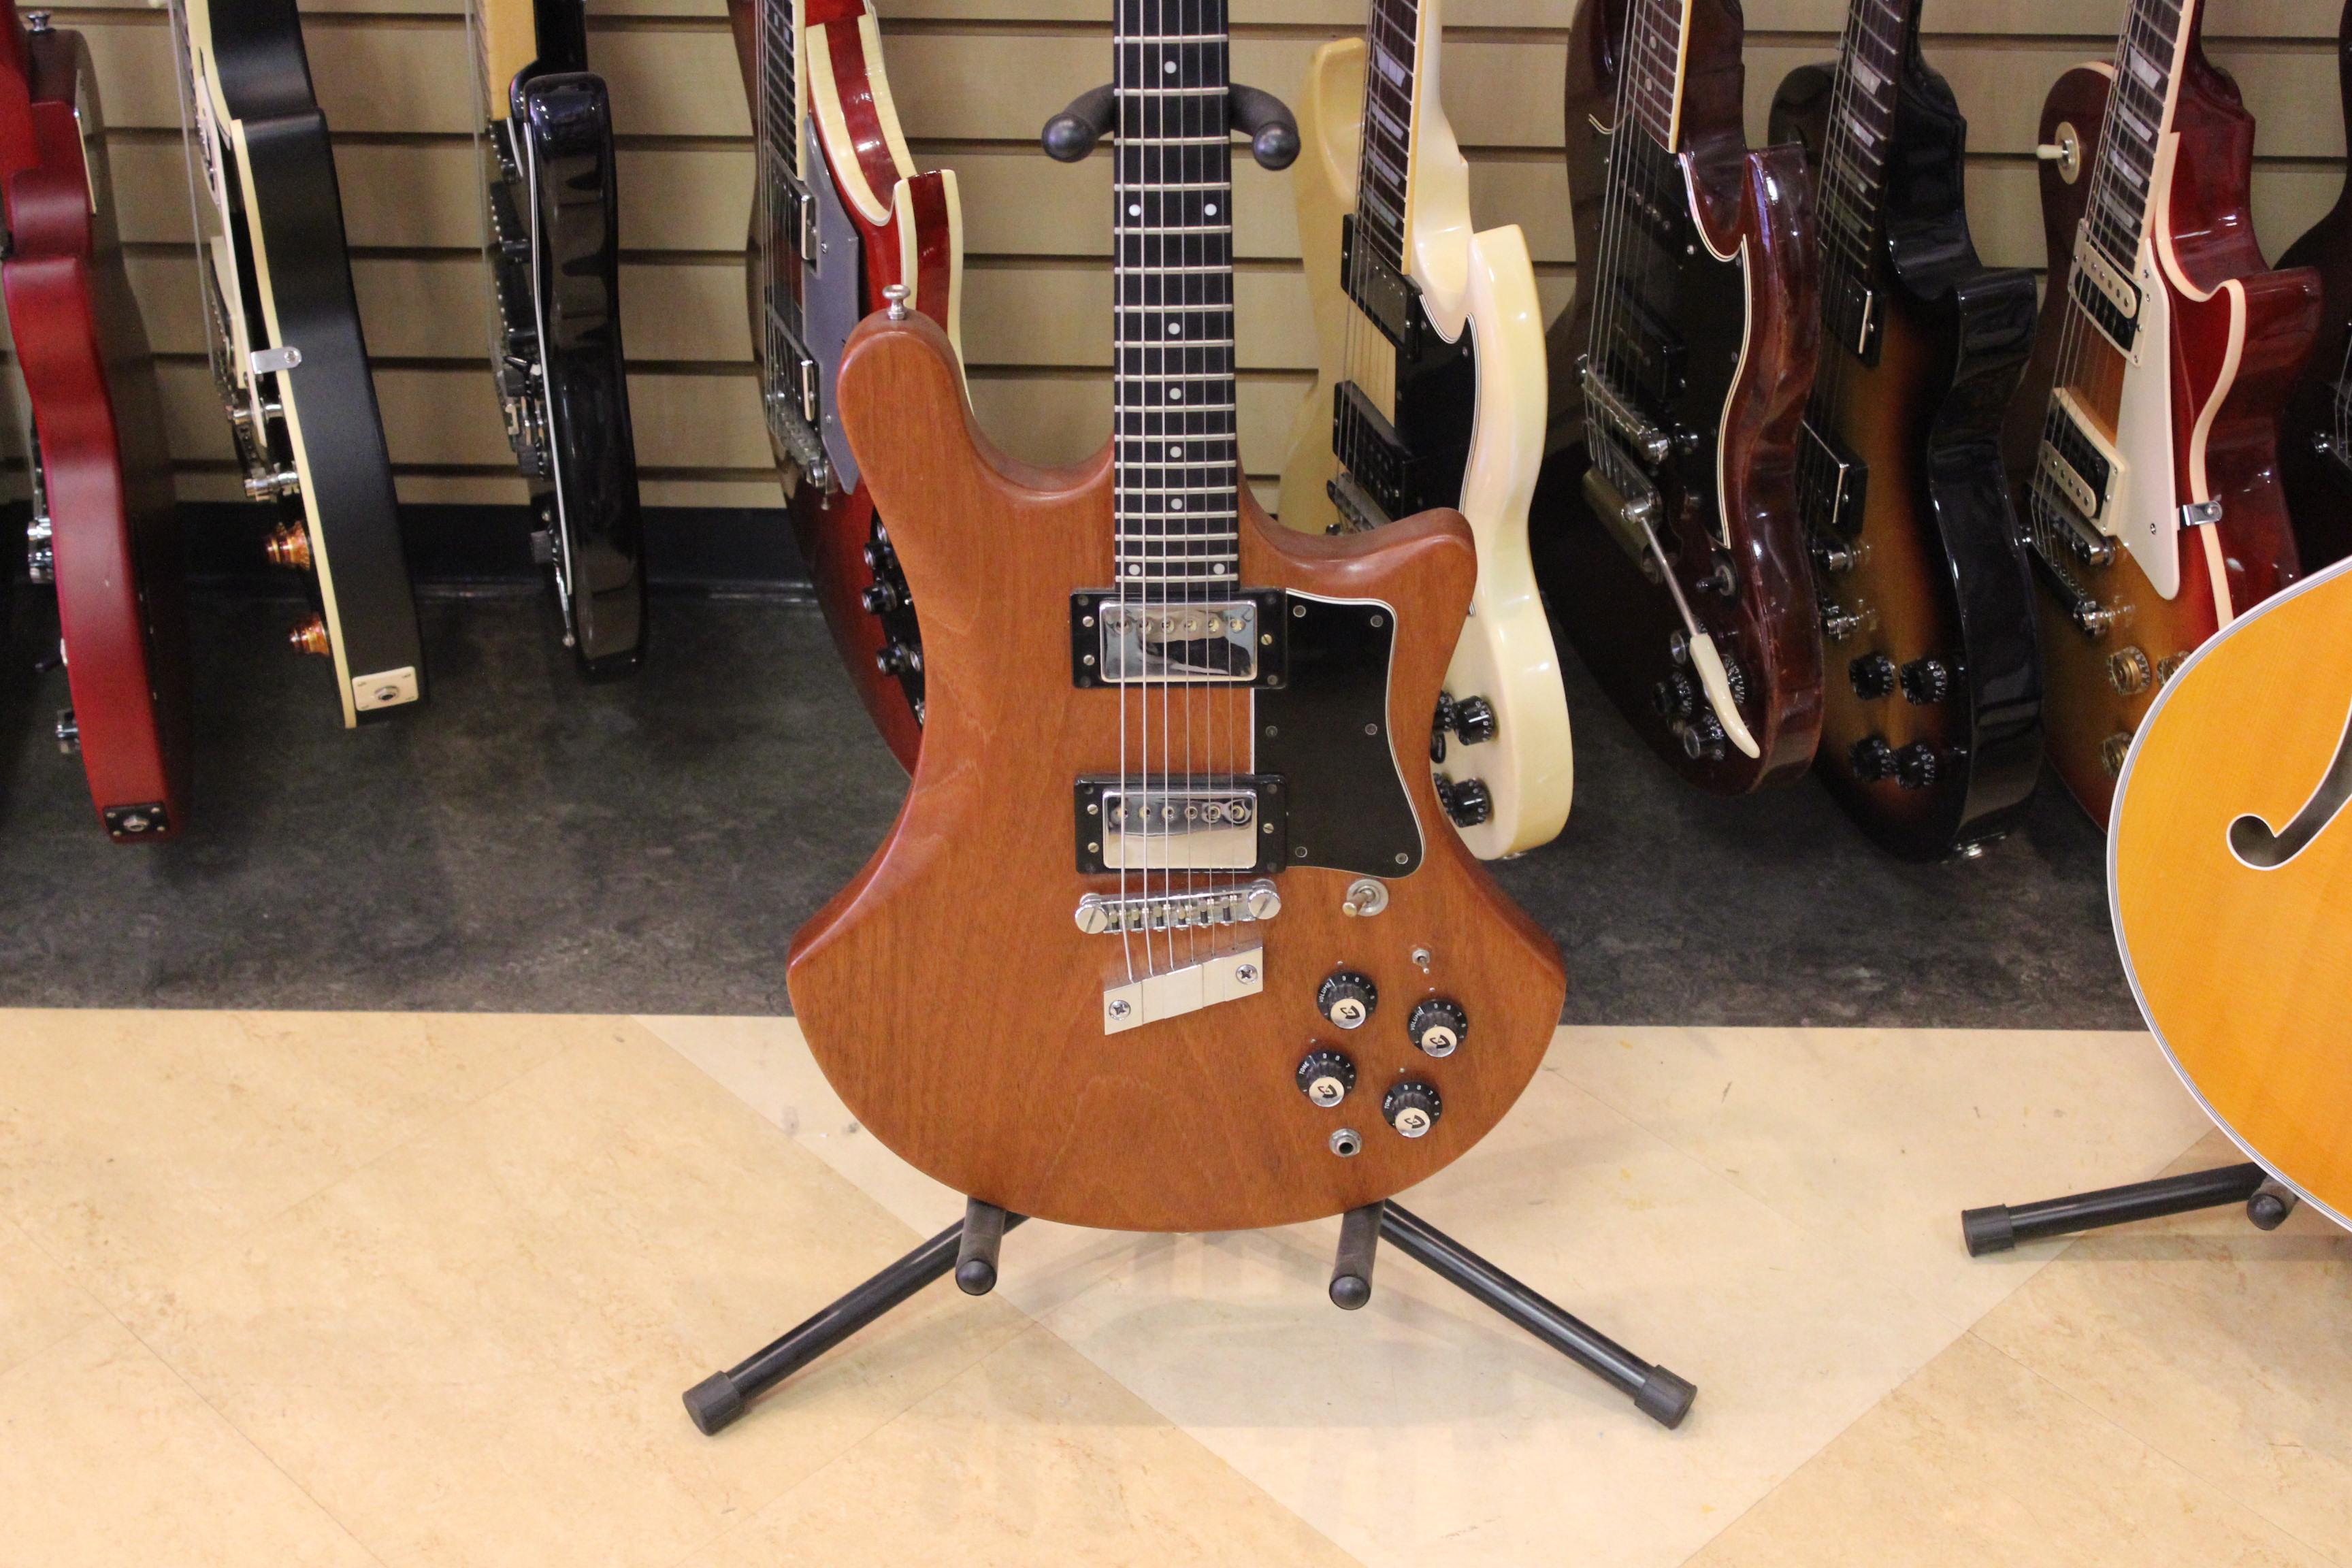 guild s3000d vintage electric guitar 1978 used ted 39 s pawn shop. Black Bedroom Furniture Sets. Home Design Ideas